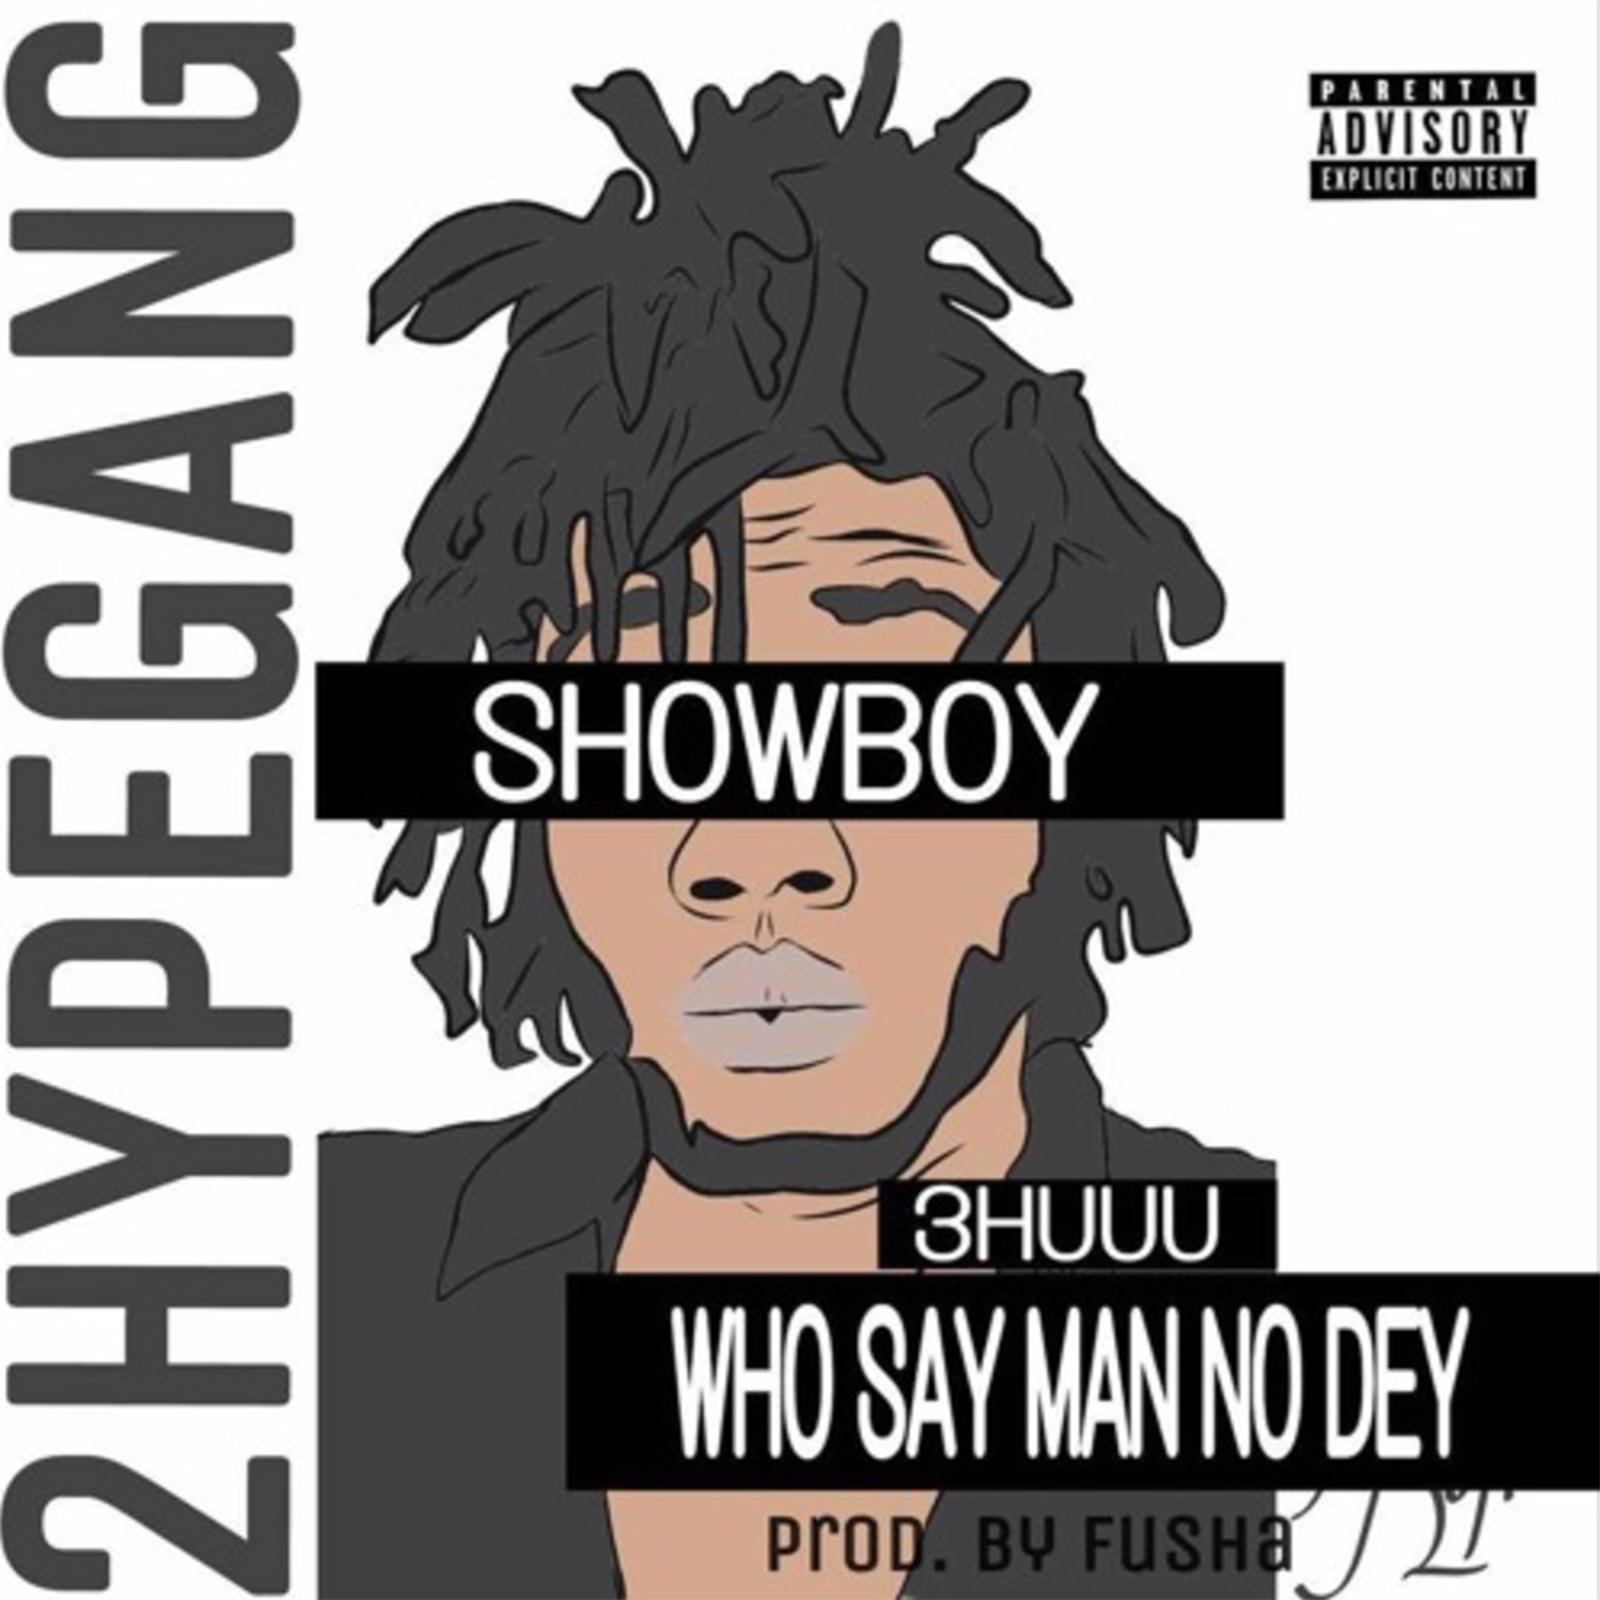 3huu (Who Say Man No Dey) by Showboy